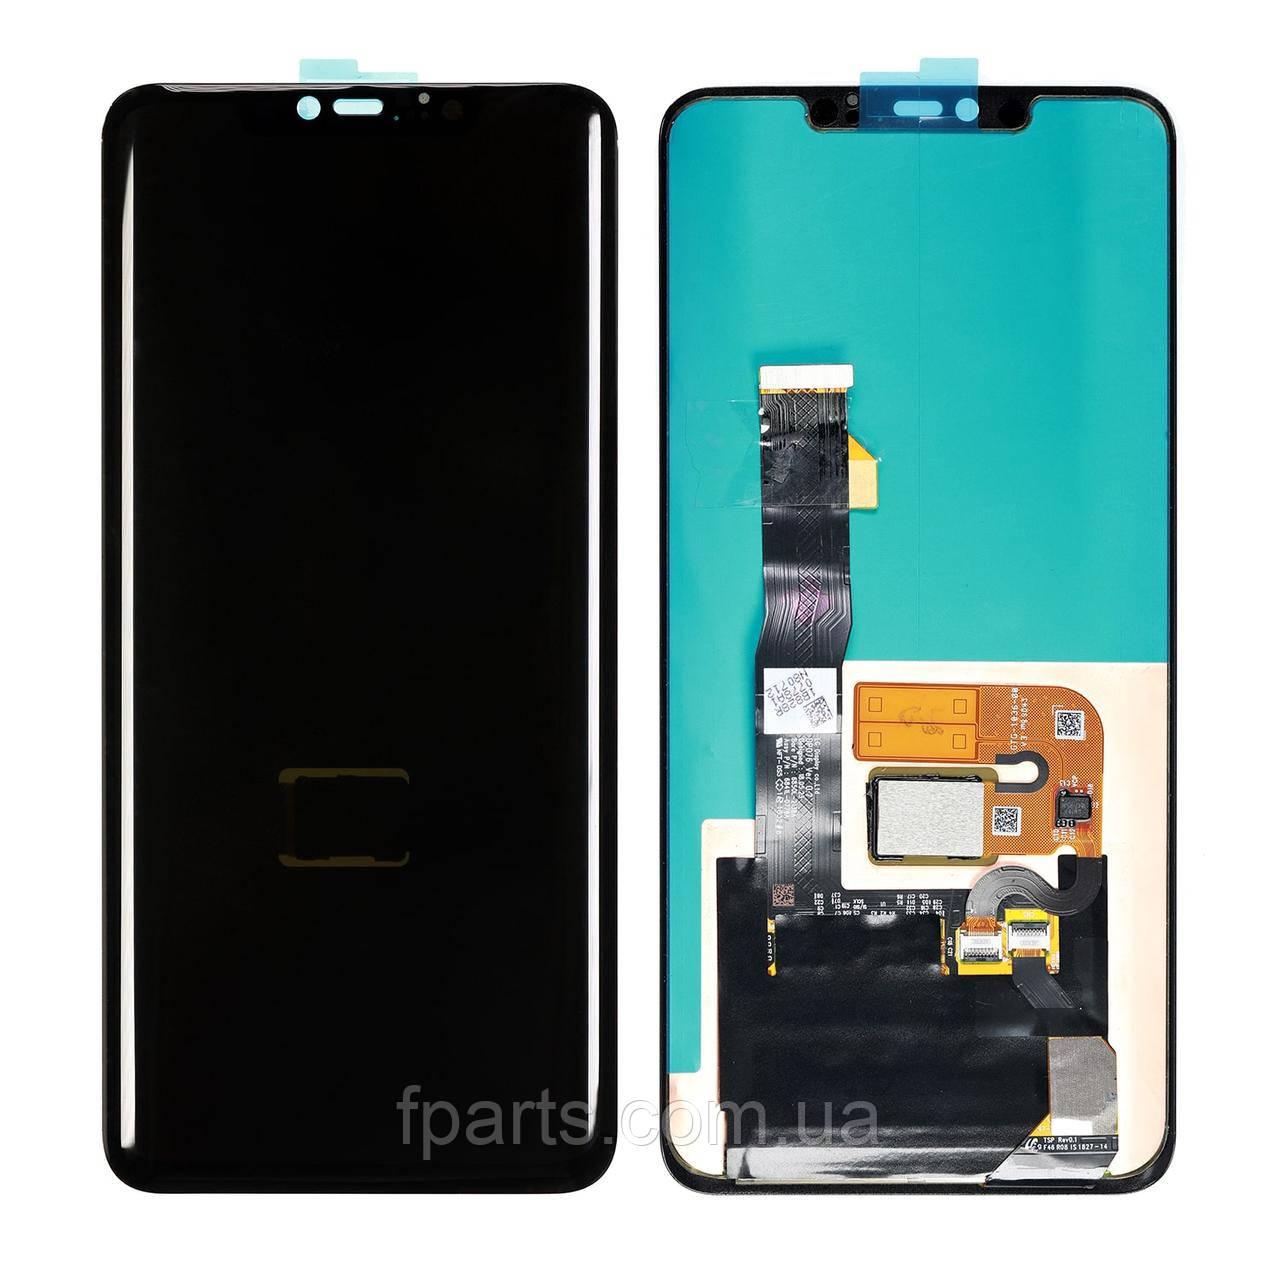 Дисплей Huawei Mate 20 Pro (ПОВНА-L09) з відбитком пальця (Black) Original